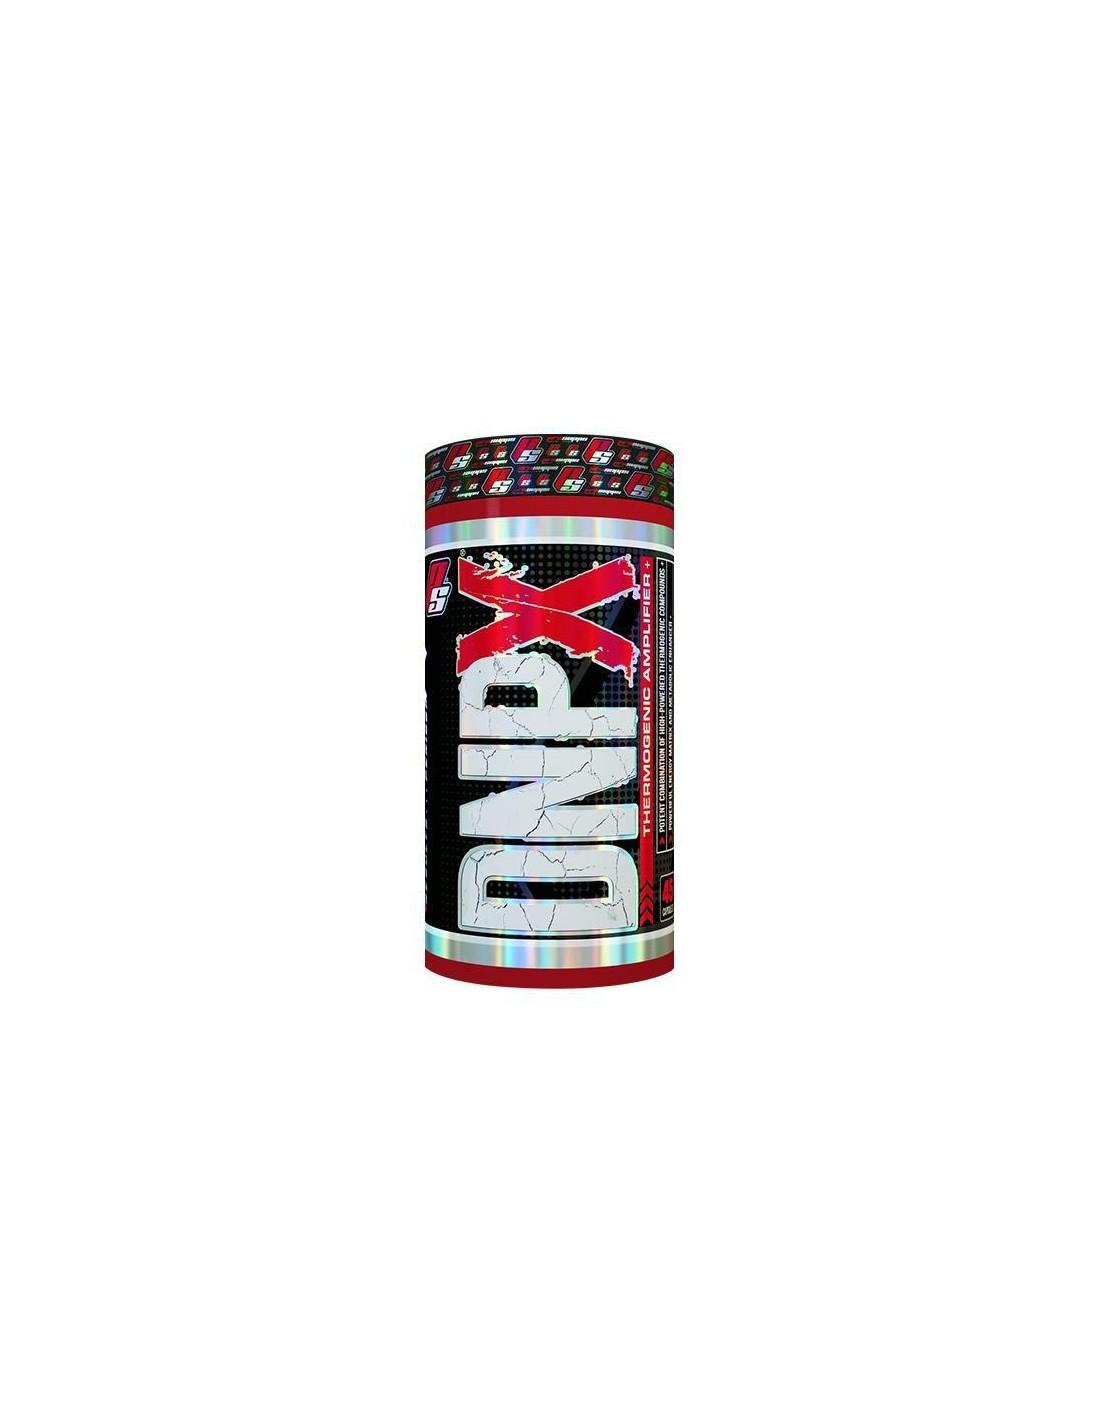 PS DNPX NEW 45 capsule